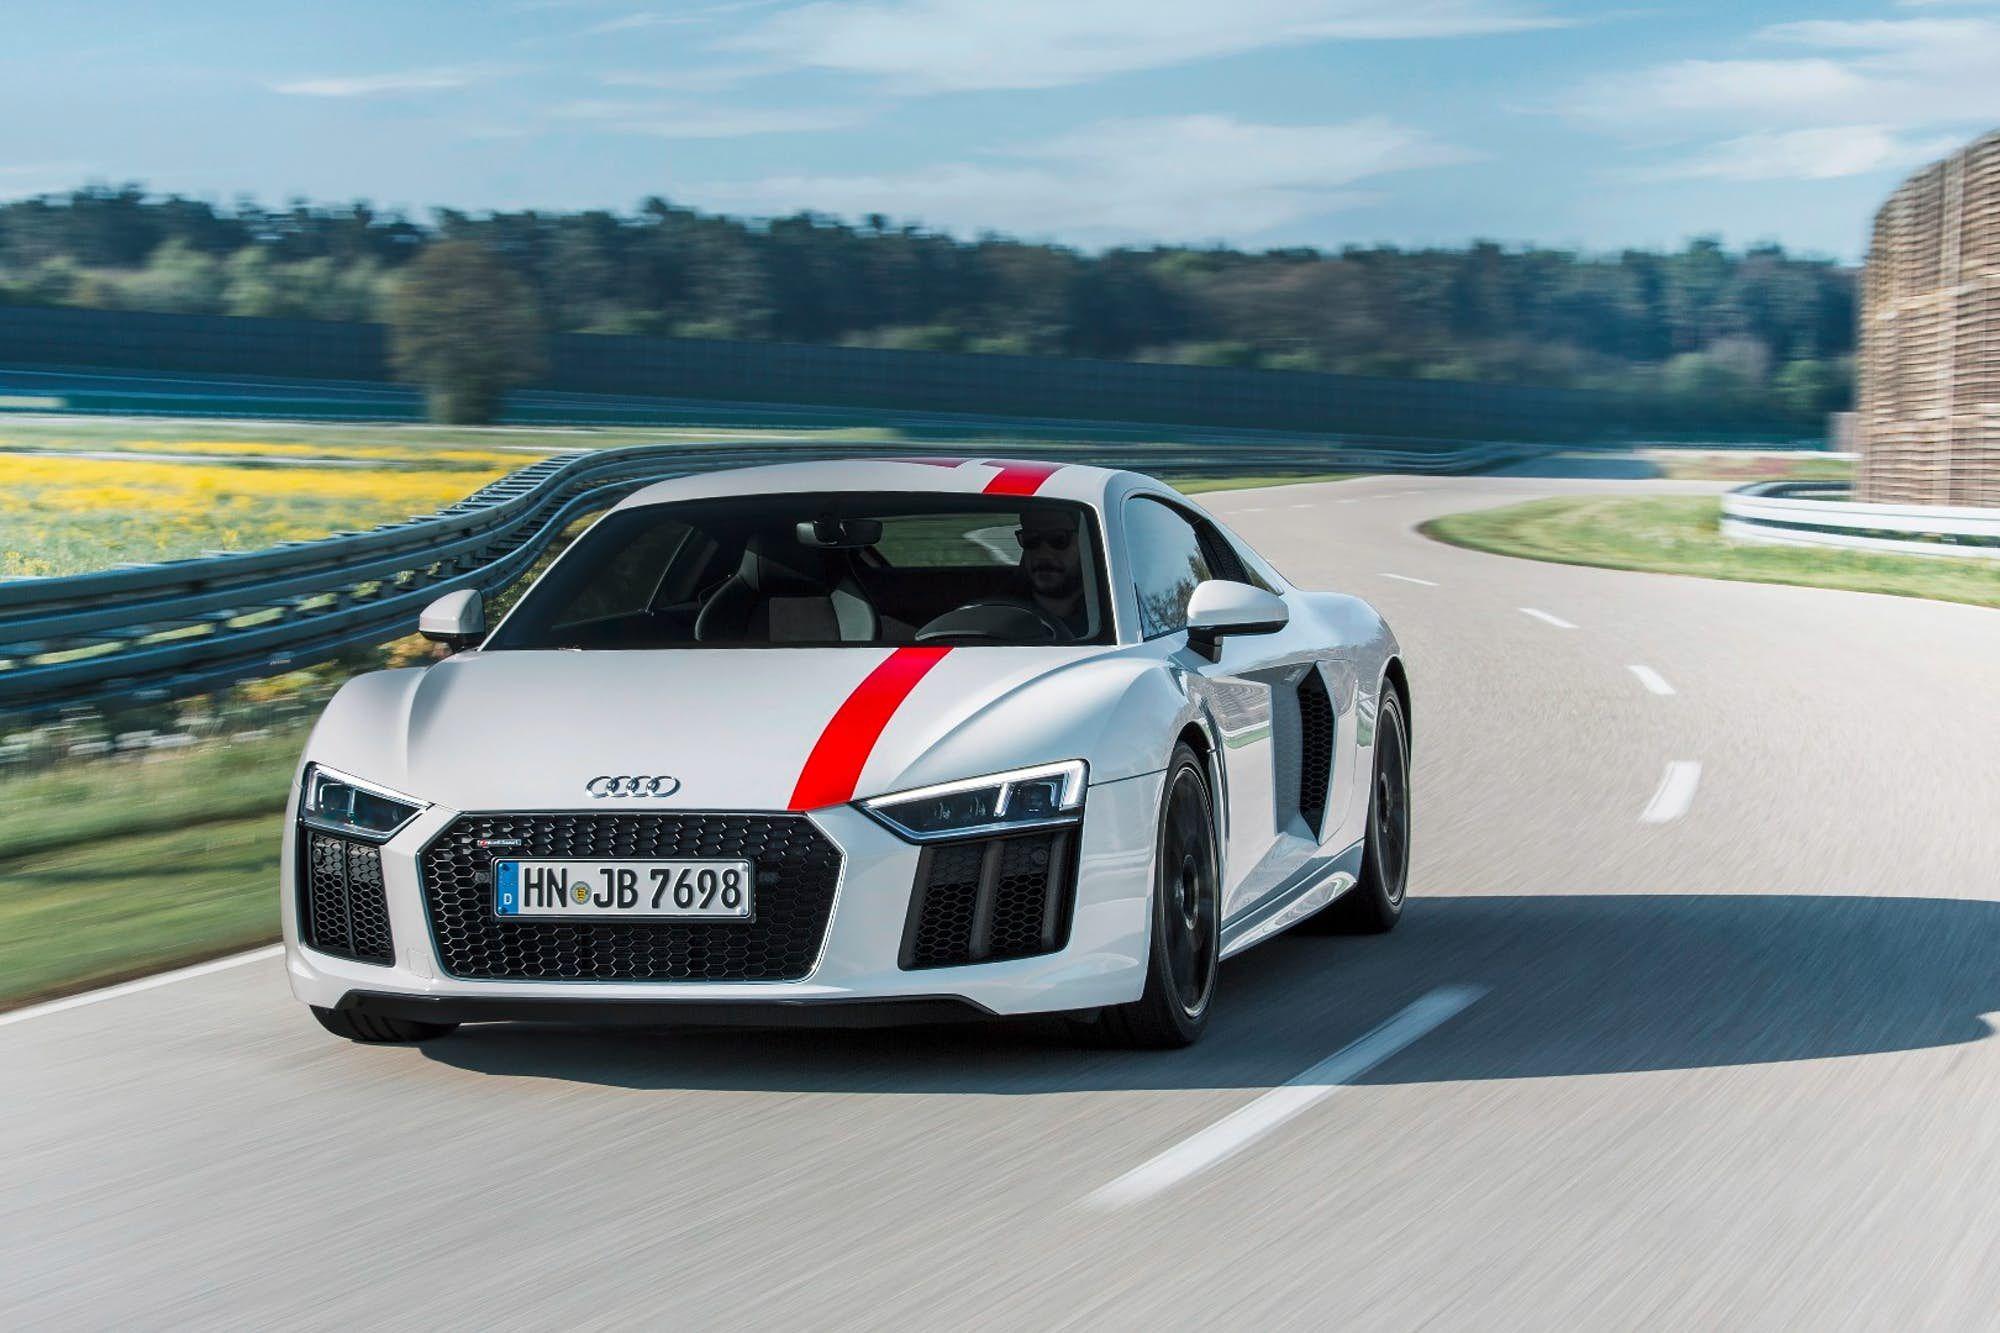 Audi Creates Limited Run R8 V10 Rws For Controlled Drifters Audi R8 V10 Audi Rear Wheel Drive